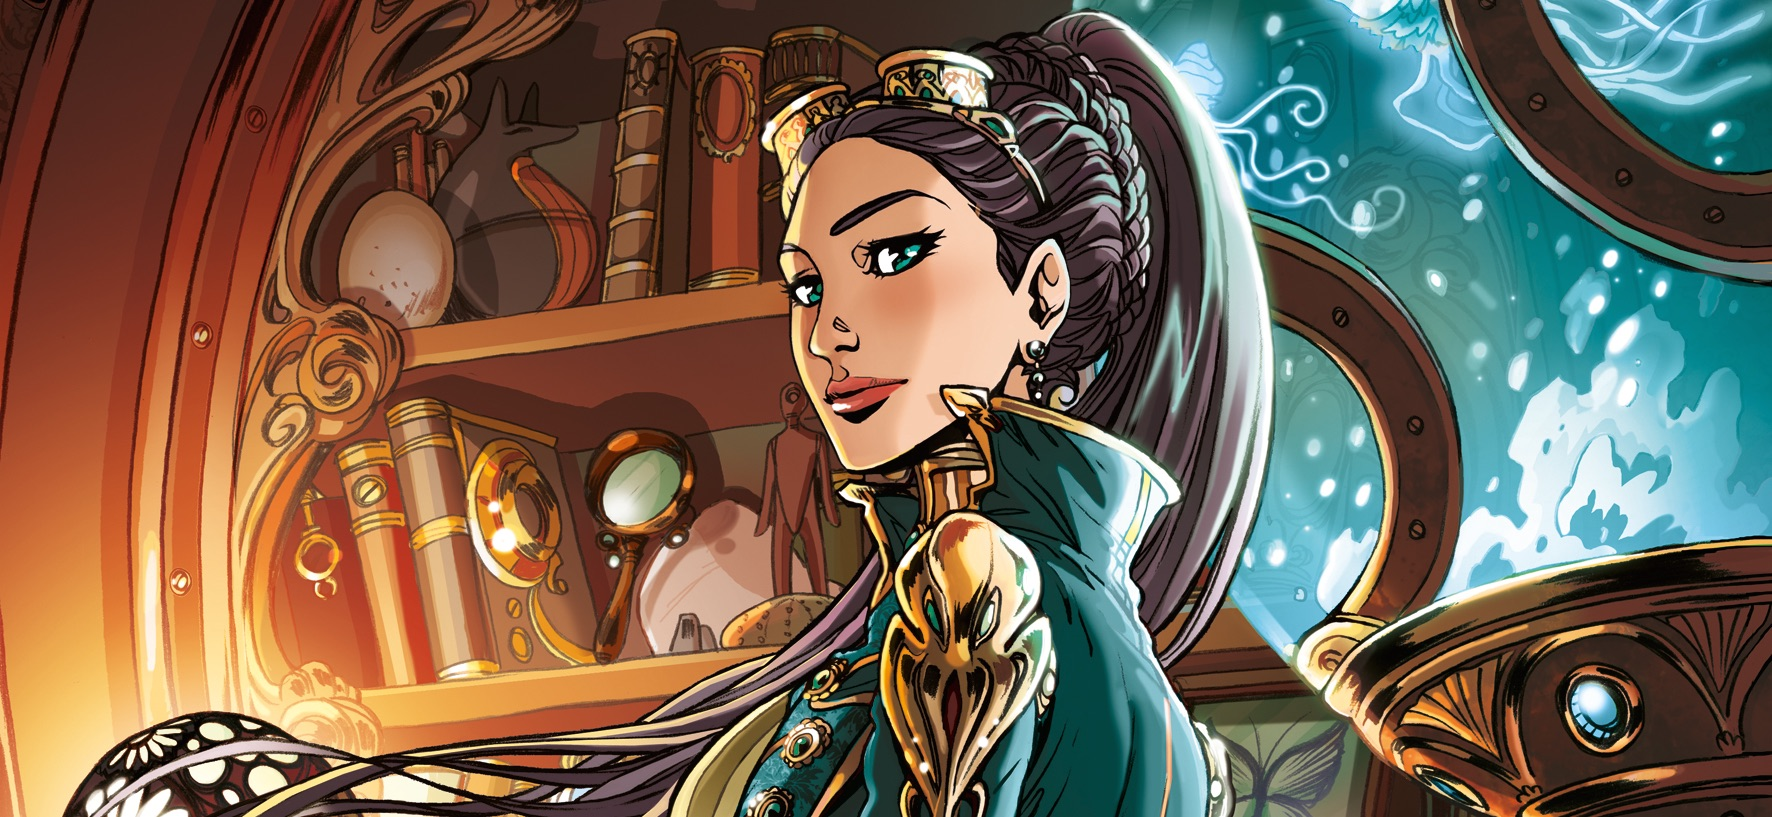 Des princesses queue de dragon audrey alwett - Image de princesse sarah ...